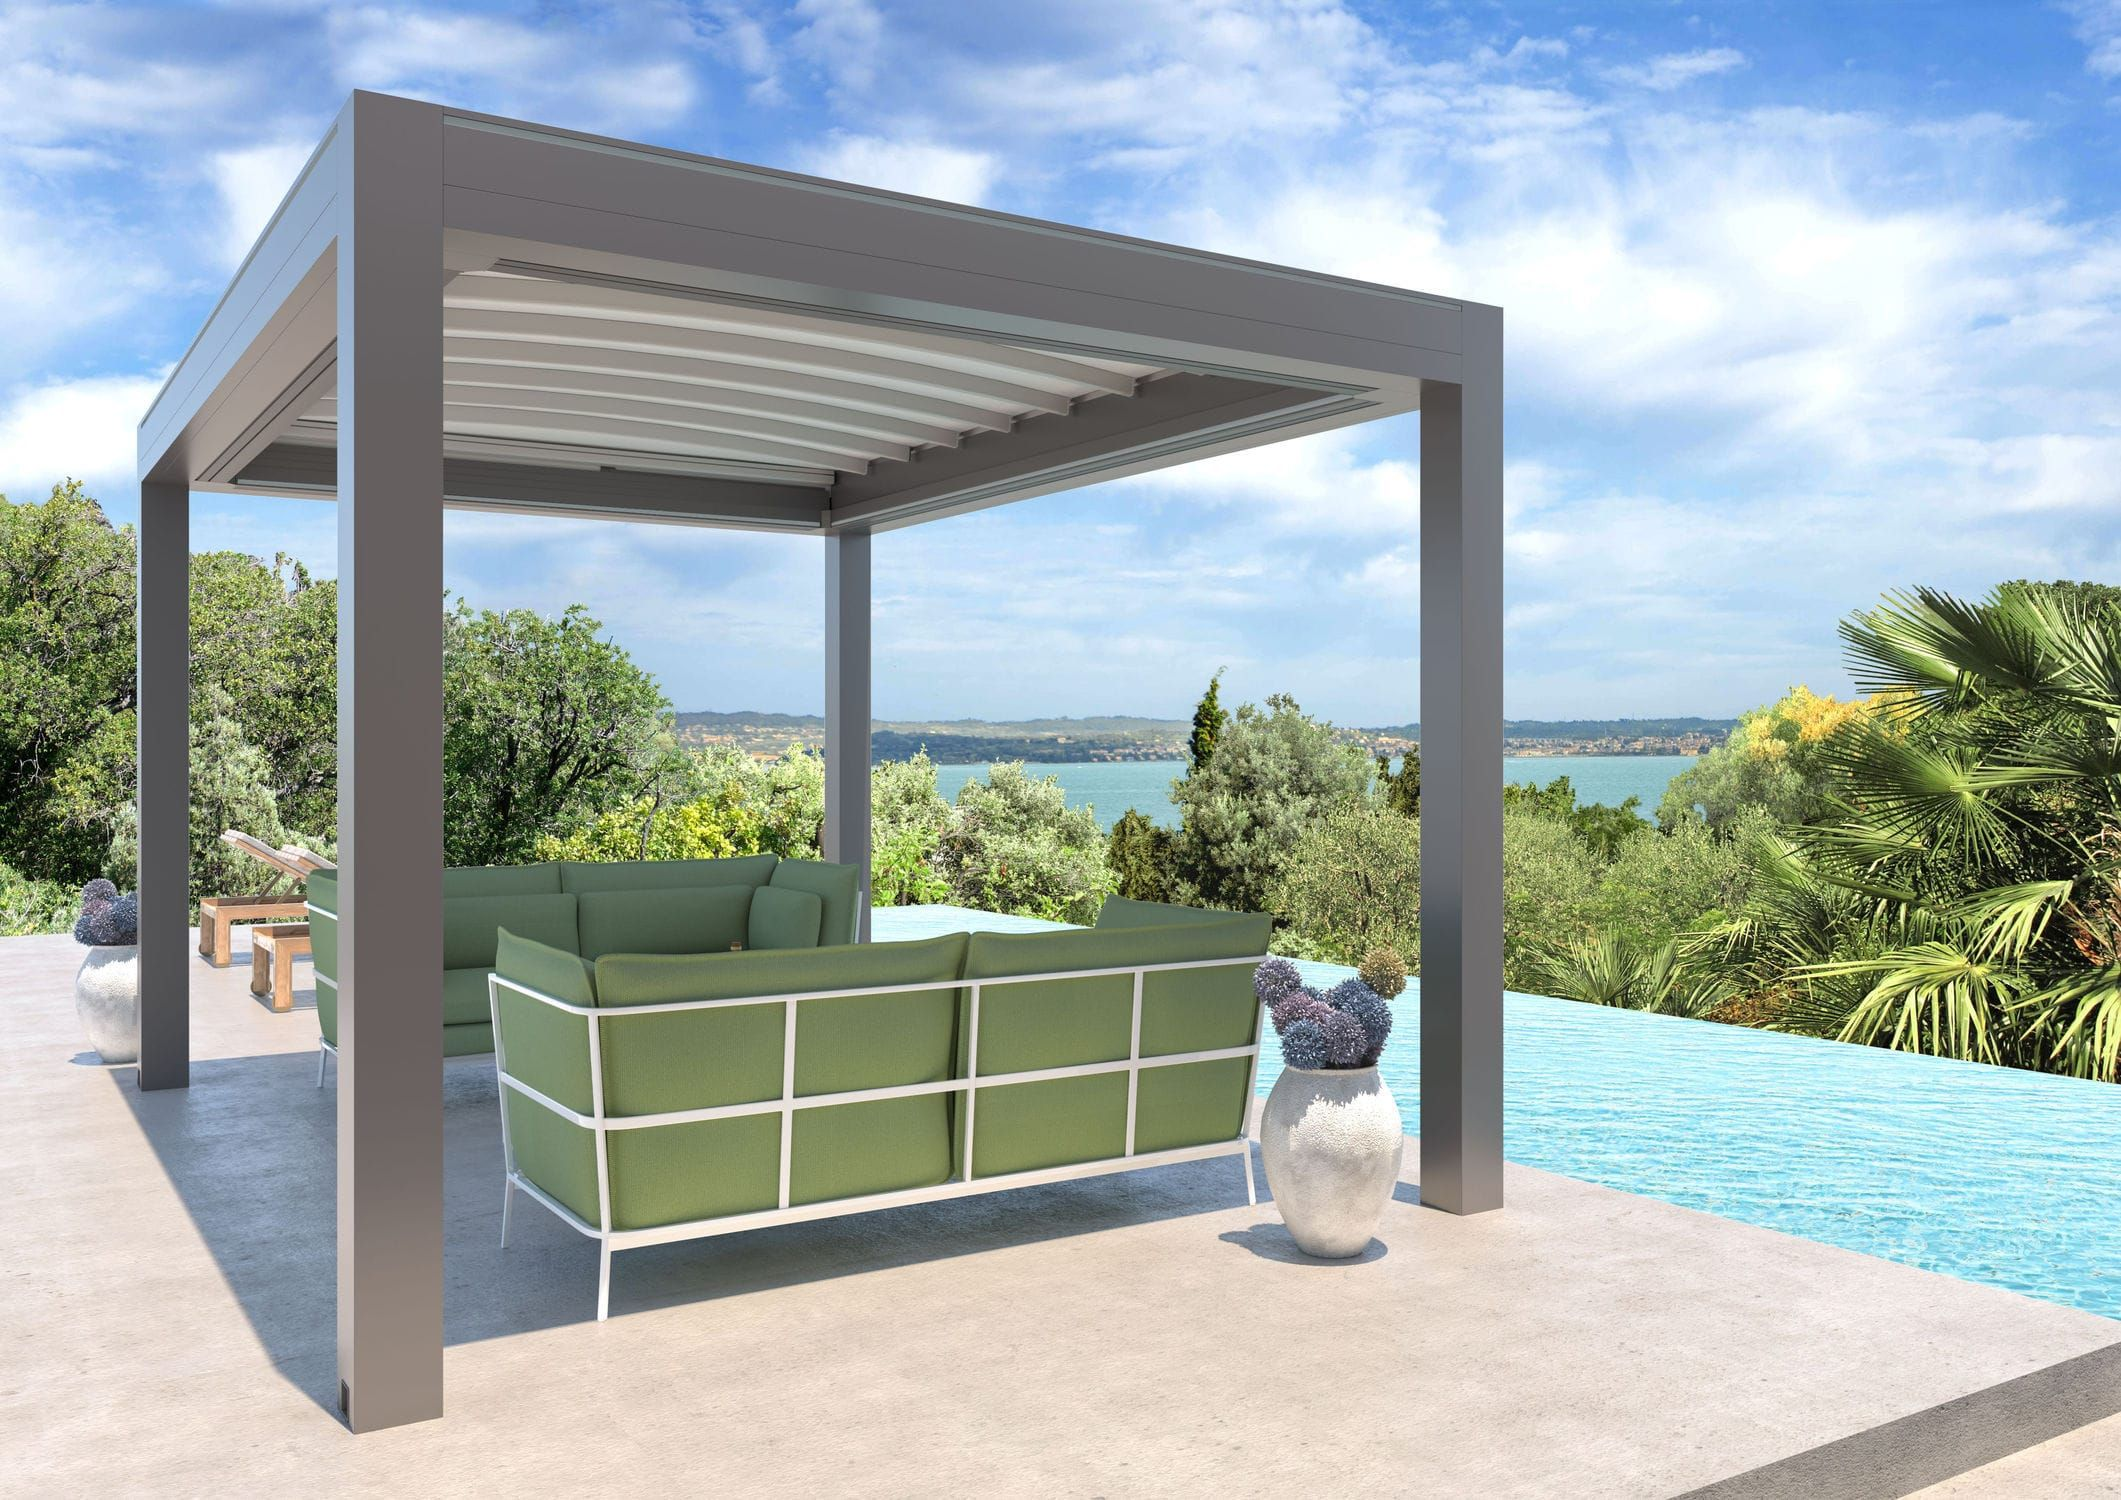 Selbsttragende Pergola Angebaut Aluminium Stoff Faltdach Isola 3 Ke Outdoor Design Pergola Design Outdoor Dekorationen Terassenideen